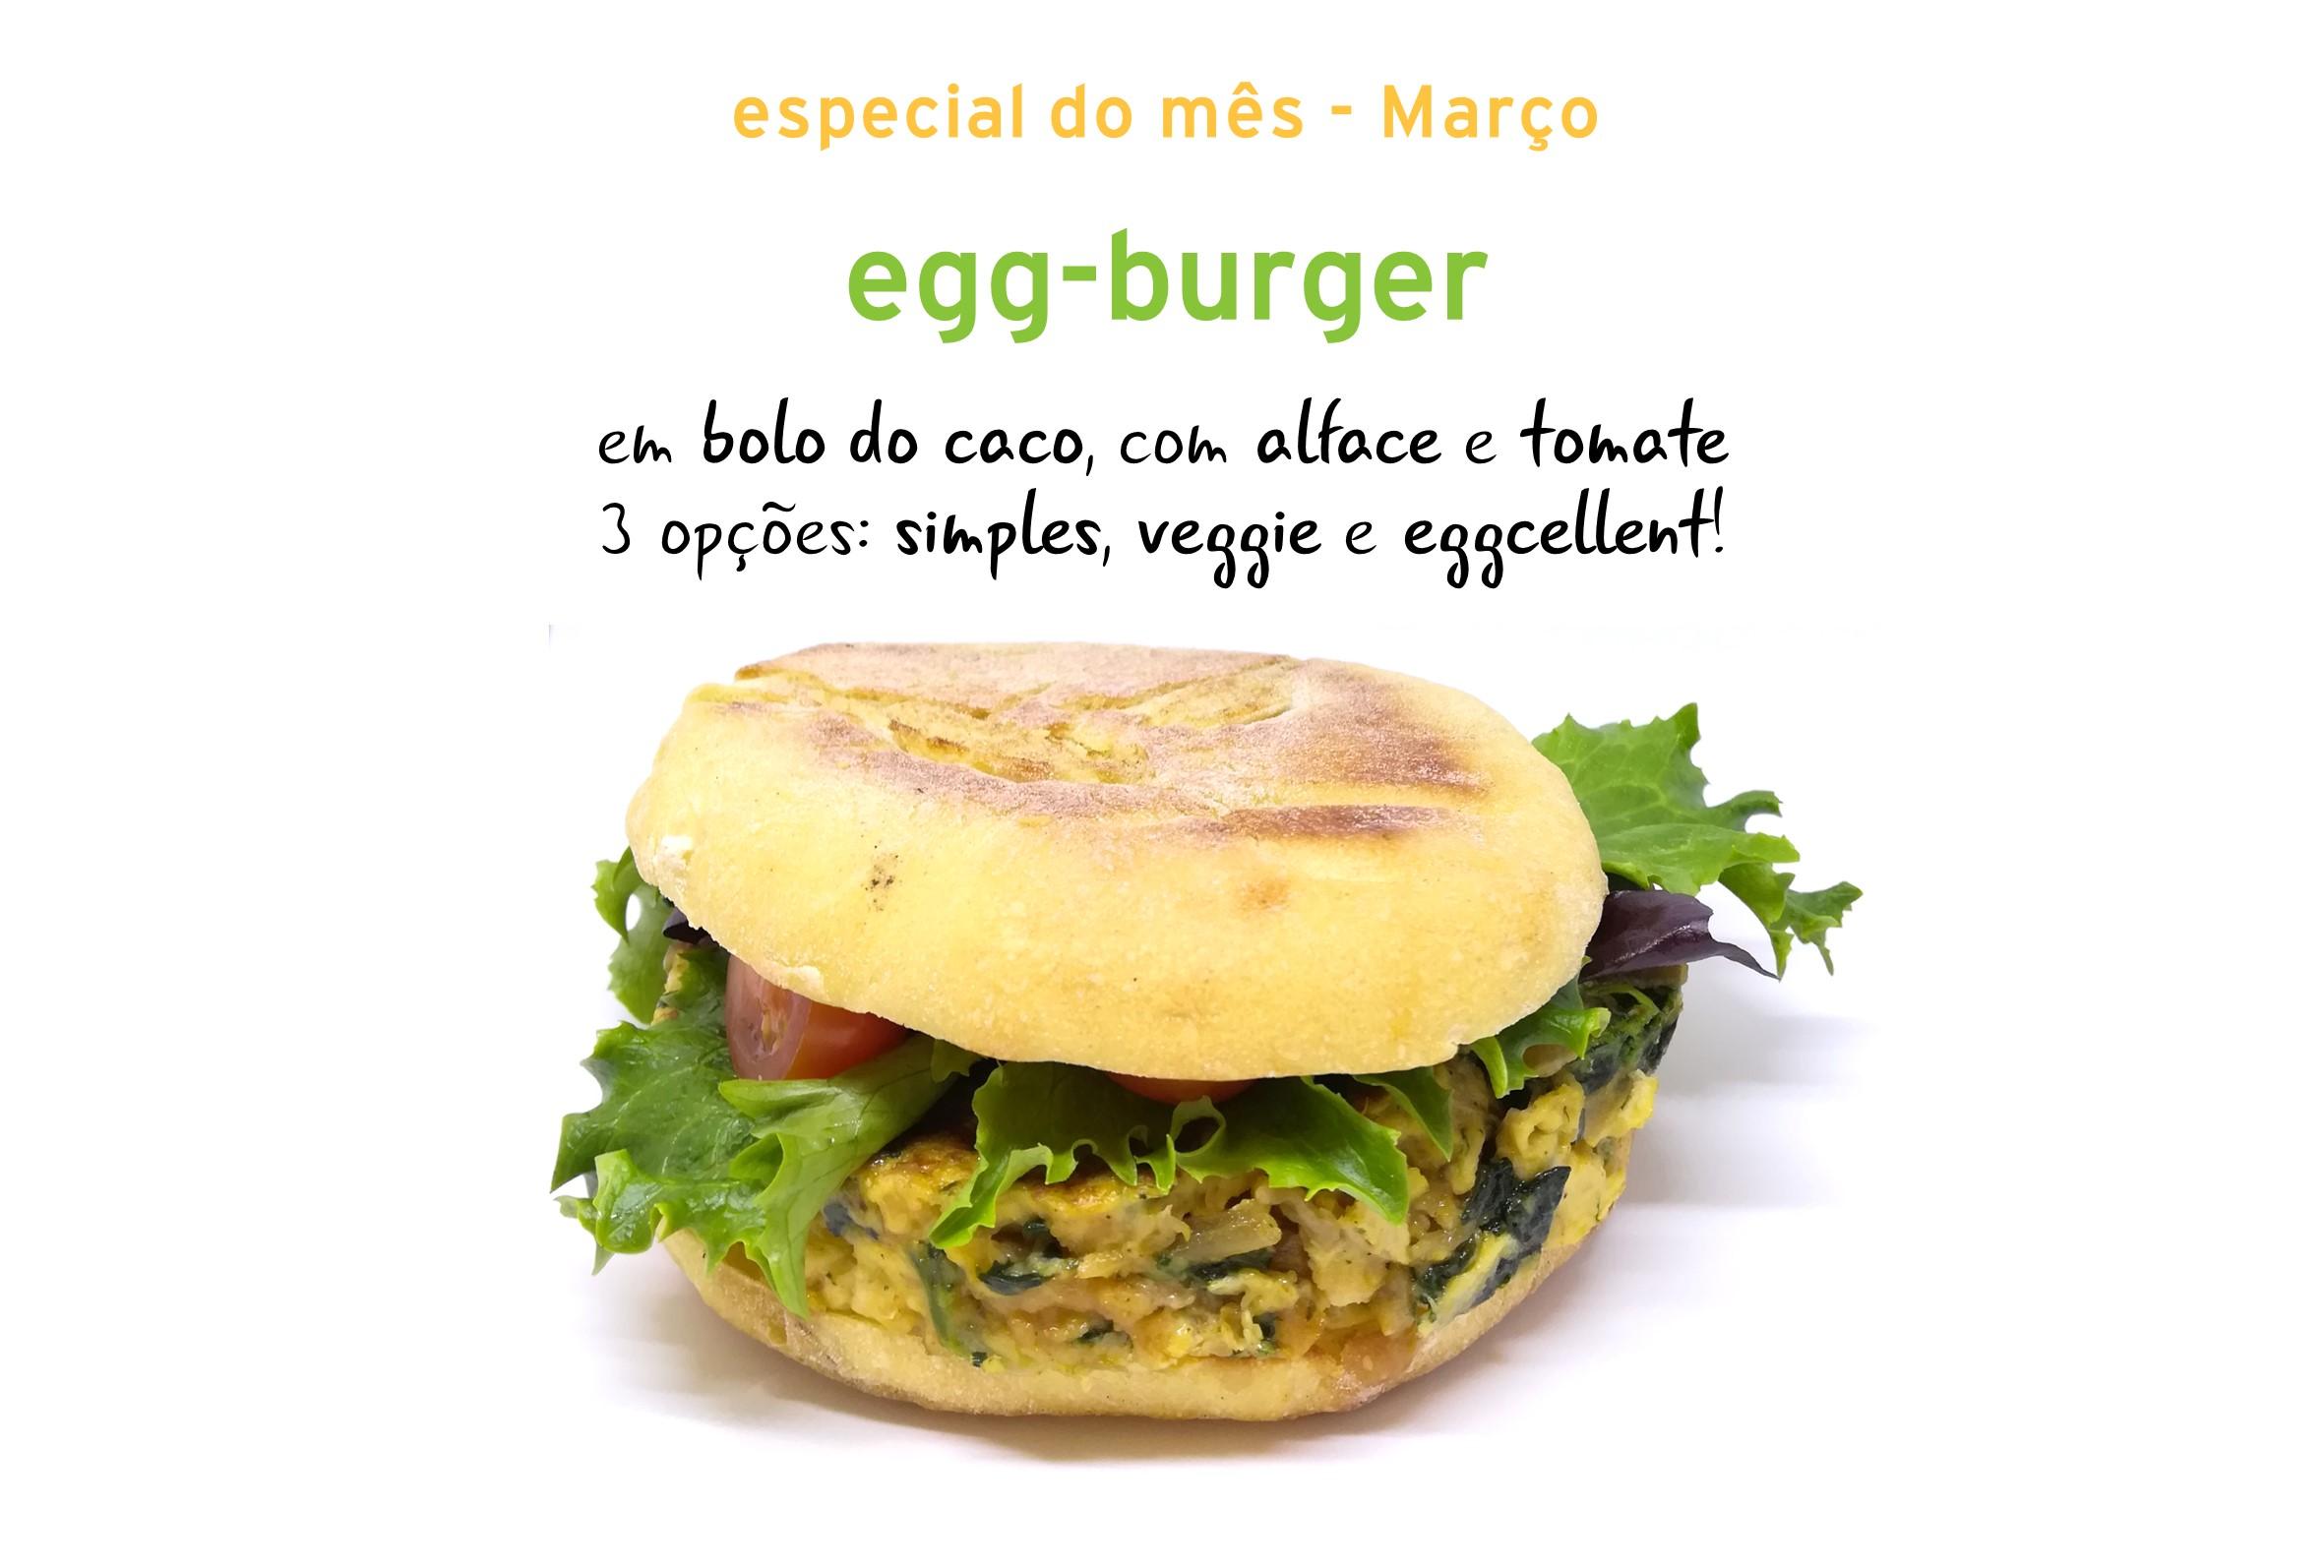 Eggburger site